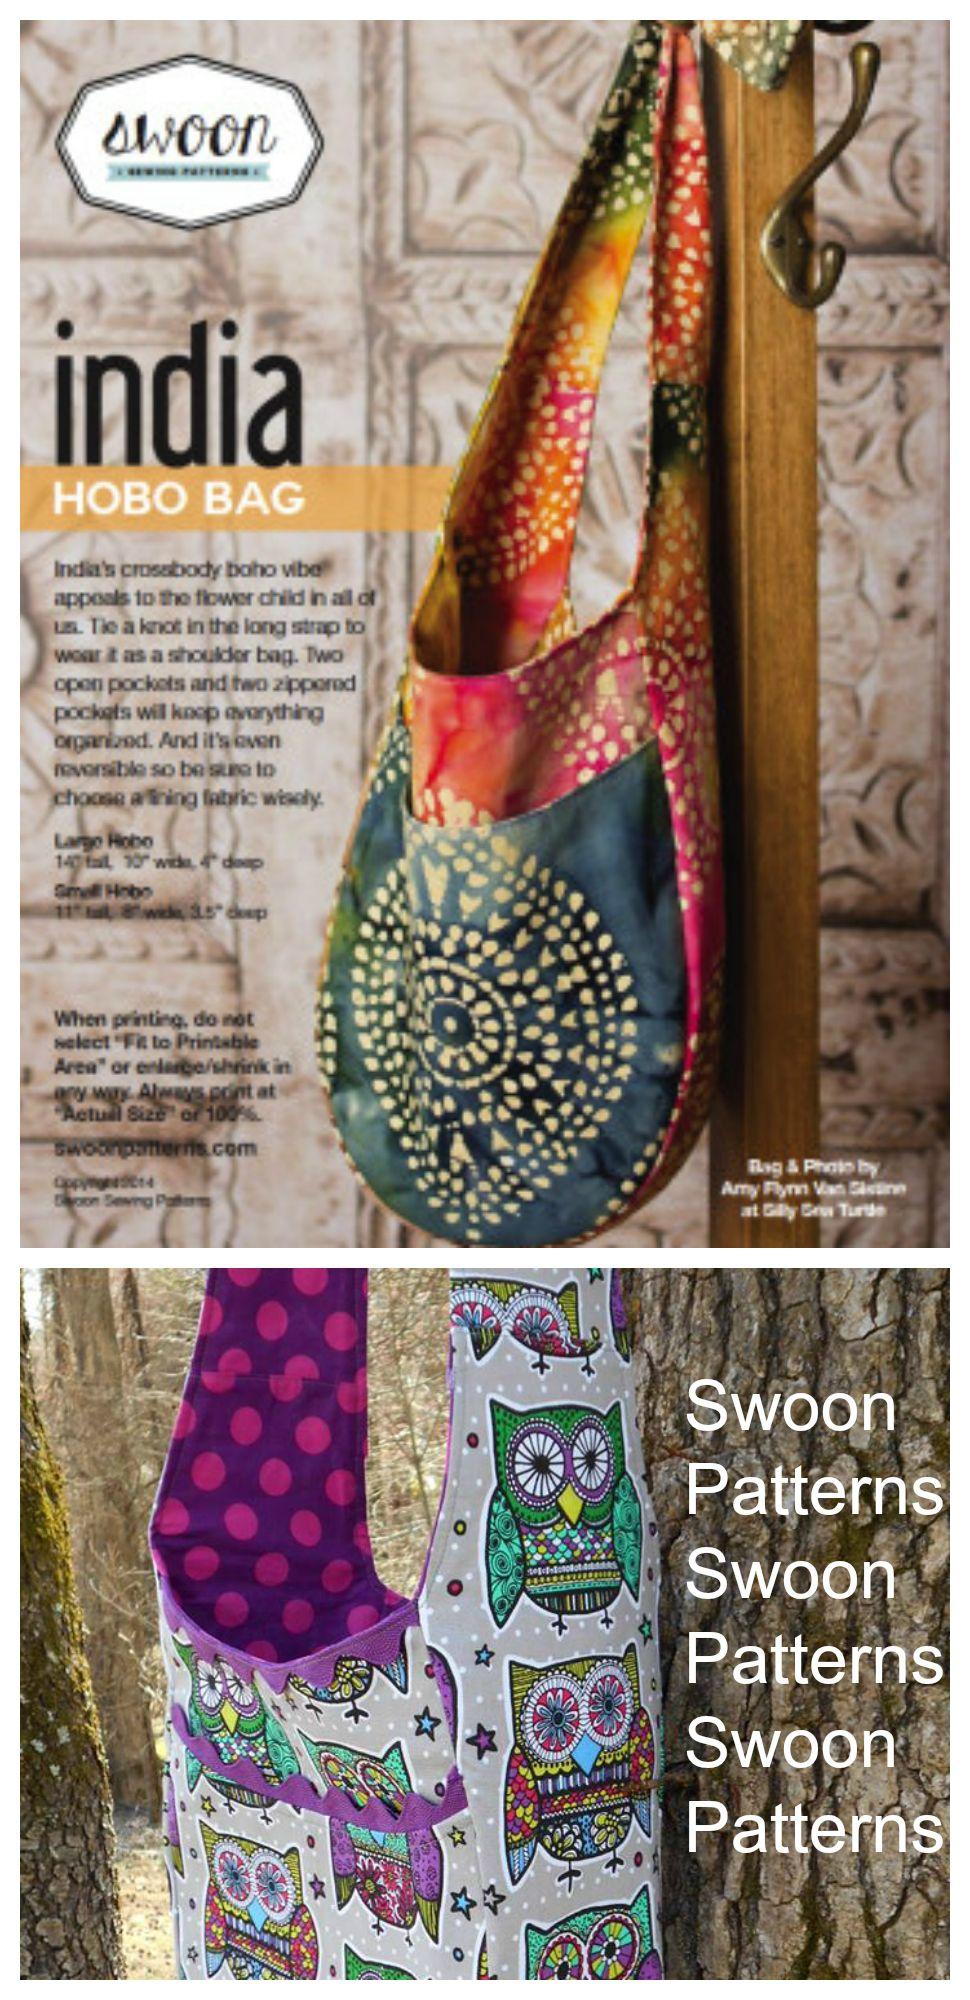 India Hobo Bag | Pinterest | Rucksack tasche, Rucksäcke und Nähen